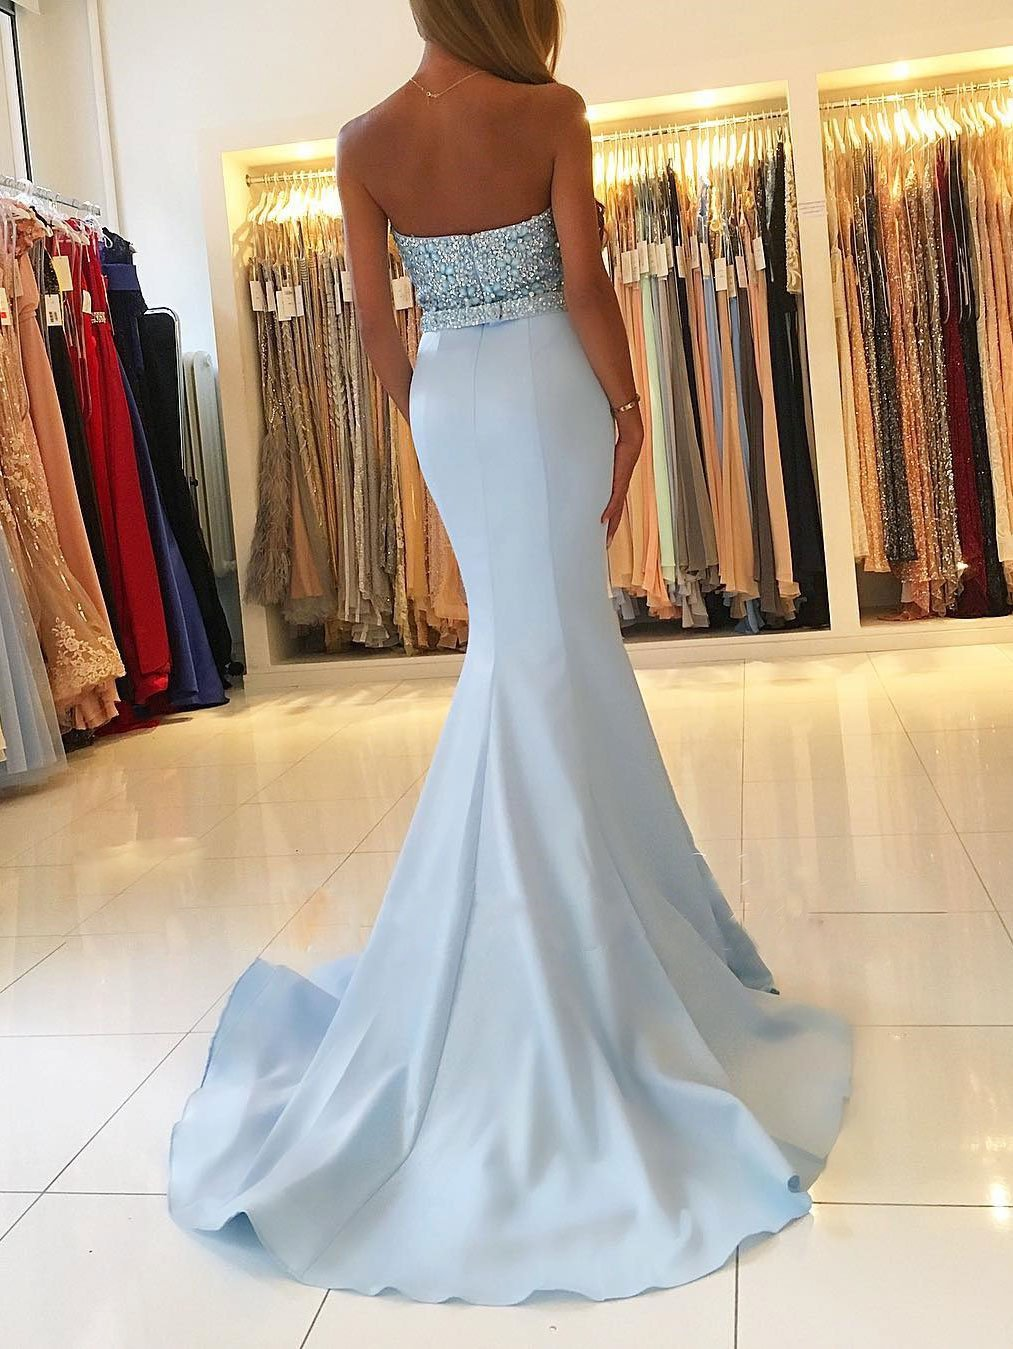 Strapless Sweetheart Neck Beaded Bodice Mermaid Prom Dresses Apd2841 Mermaid Prom Dresses Prom Dresses Blue Blue Mermaid Prom Dress [ 1349 x 1013 Pixel ]